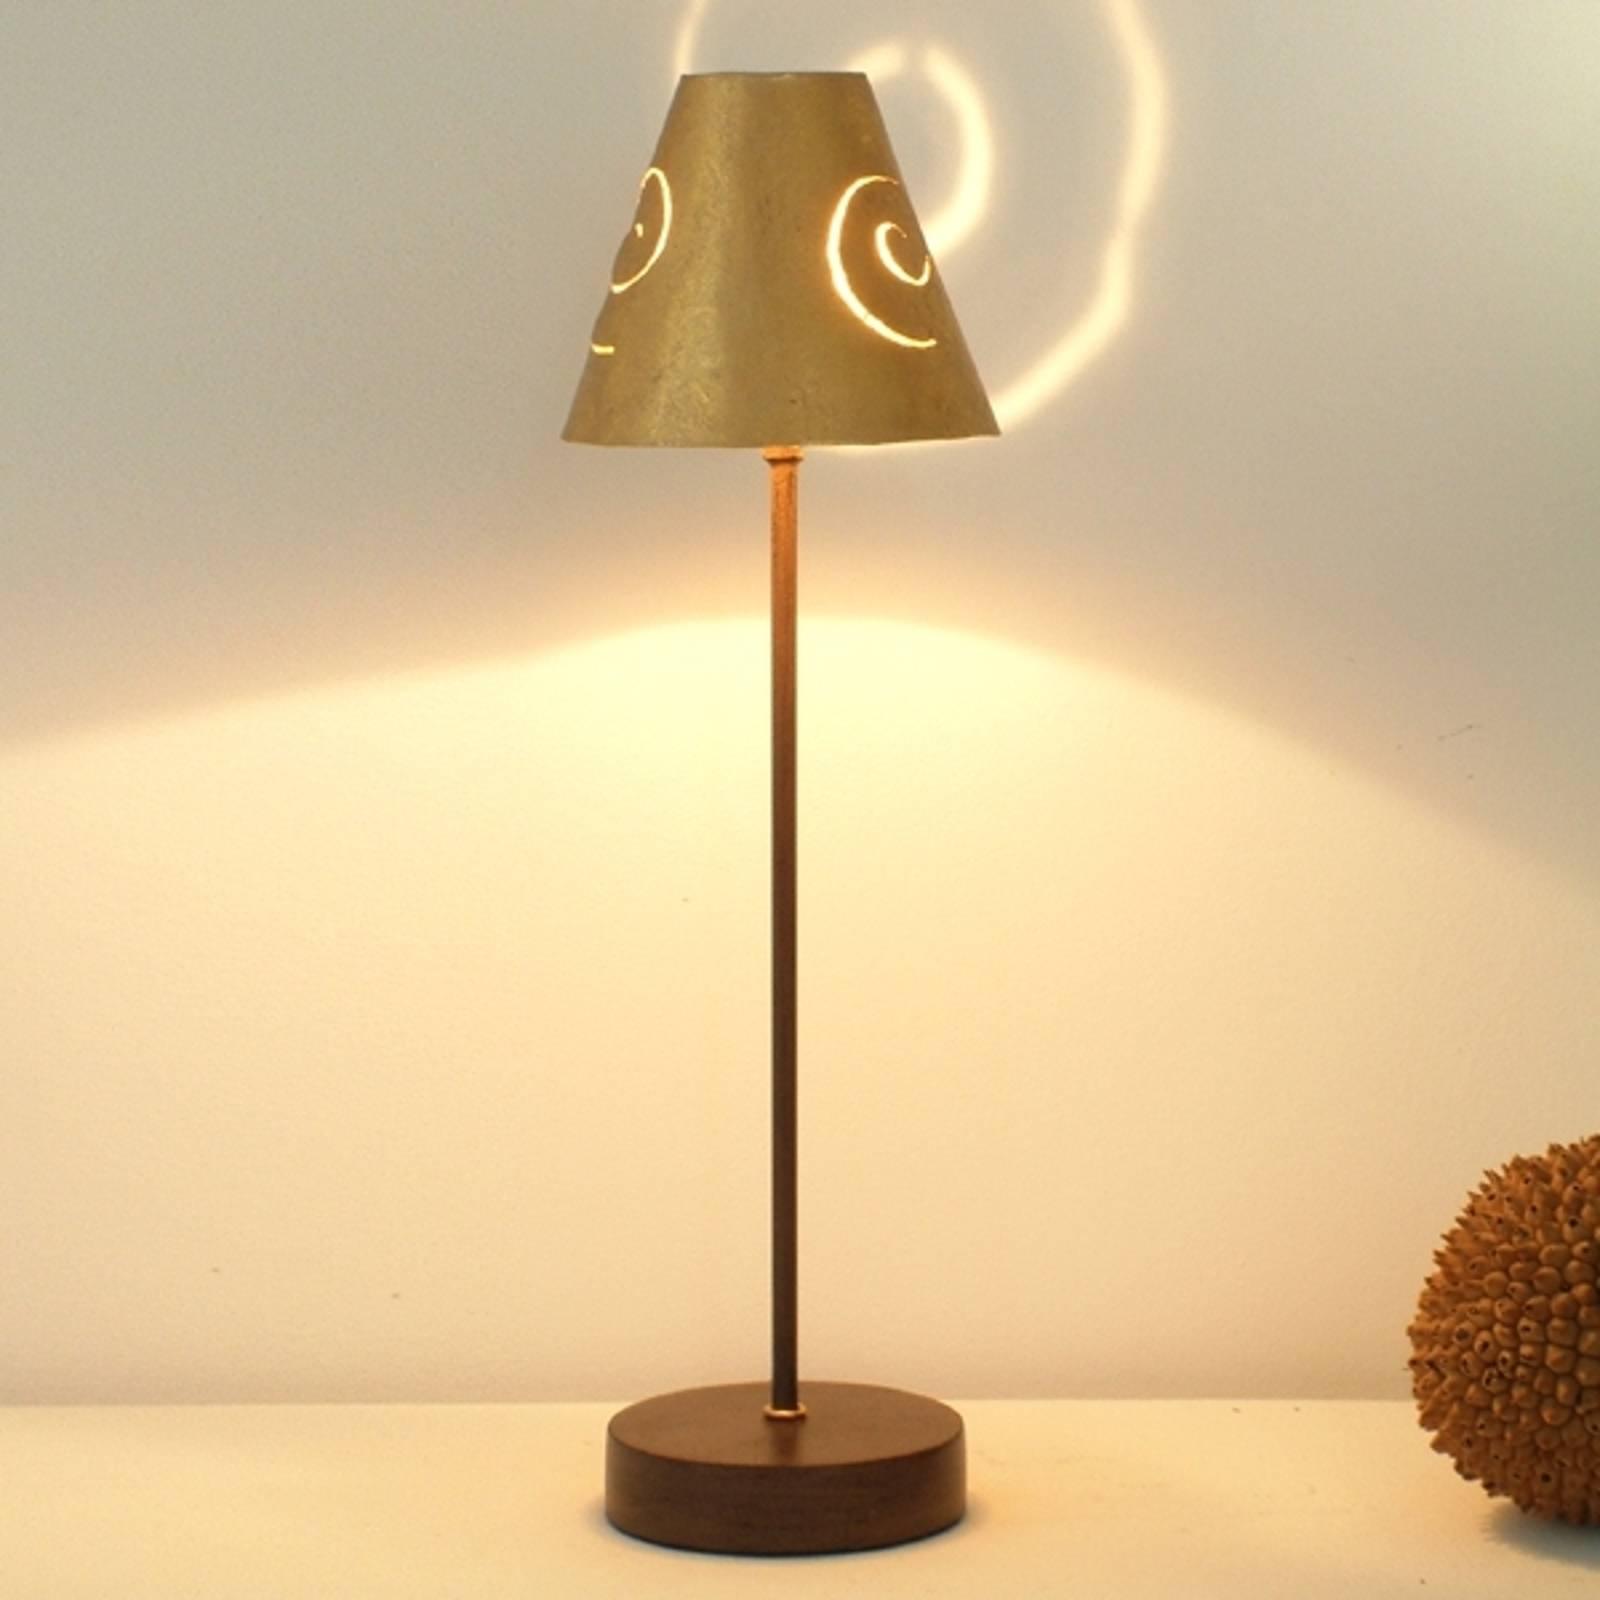 Élégante lampe à poser Schneckenhut Gold en fer